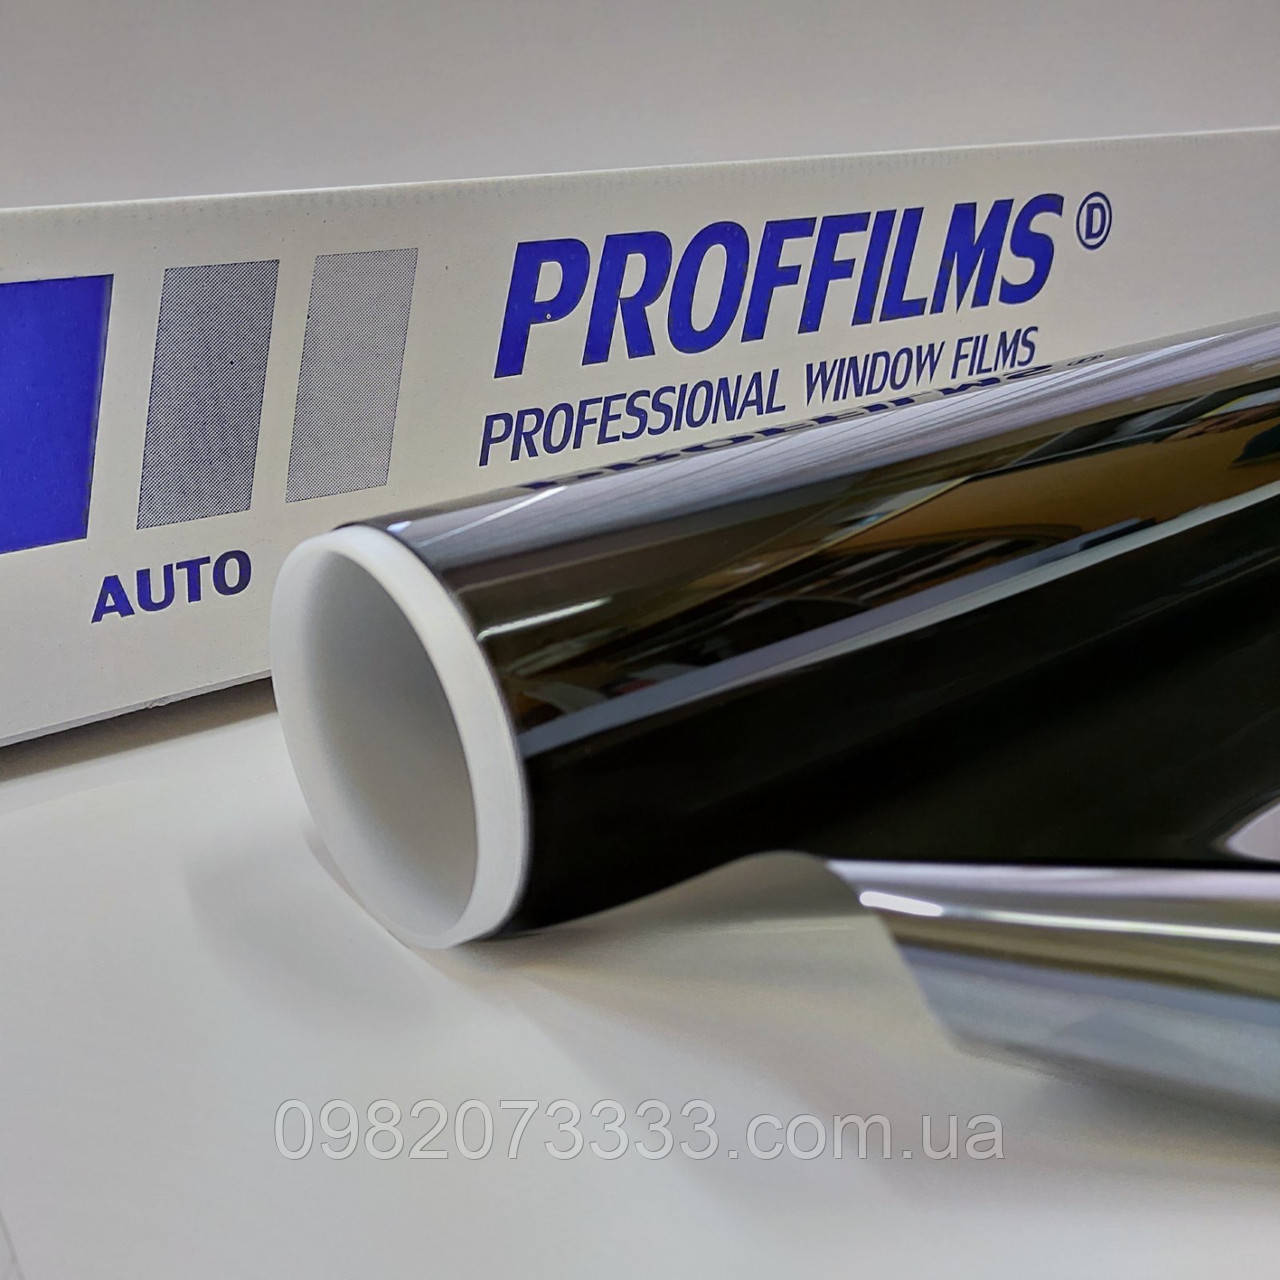 Тонировочная пленка PR CH 15% керамическая для авто. Плівка тонувальна ширина рулона 1,524 (цена за кв.м)